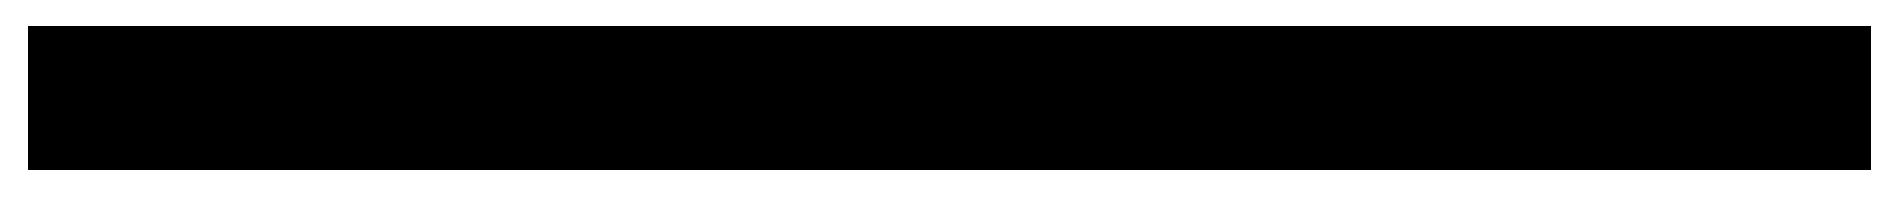 1ACT Ameri-Can Telecom Inc logo